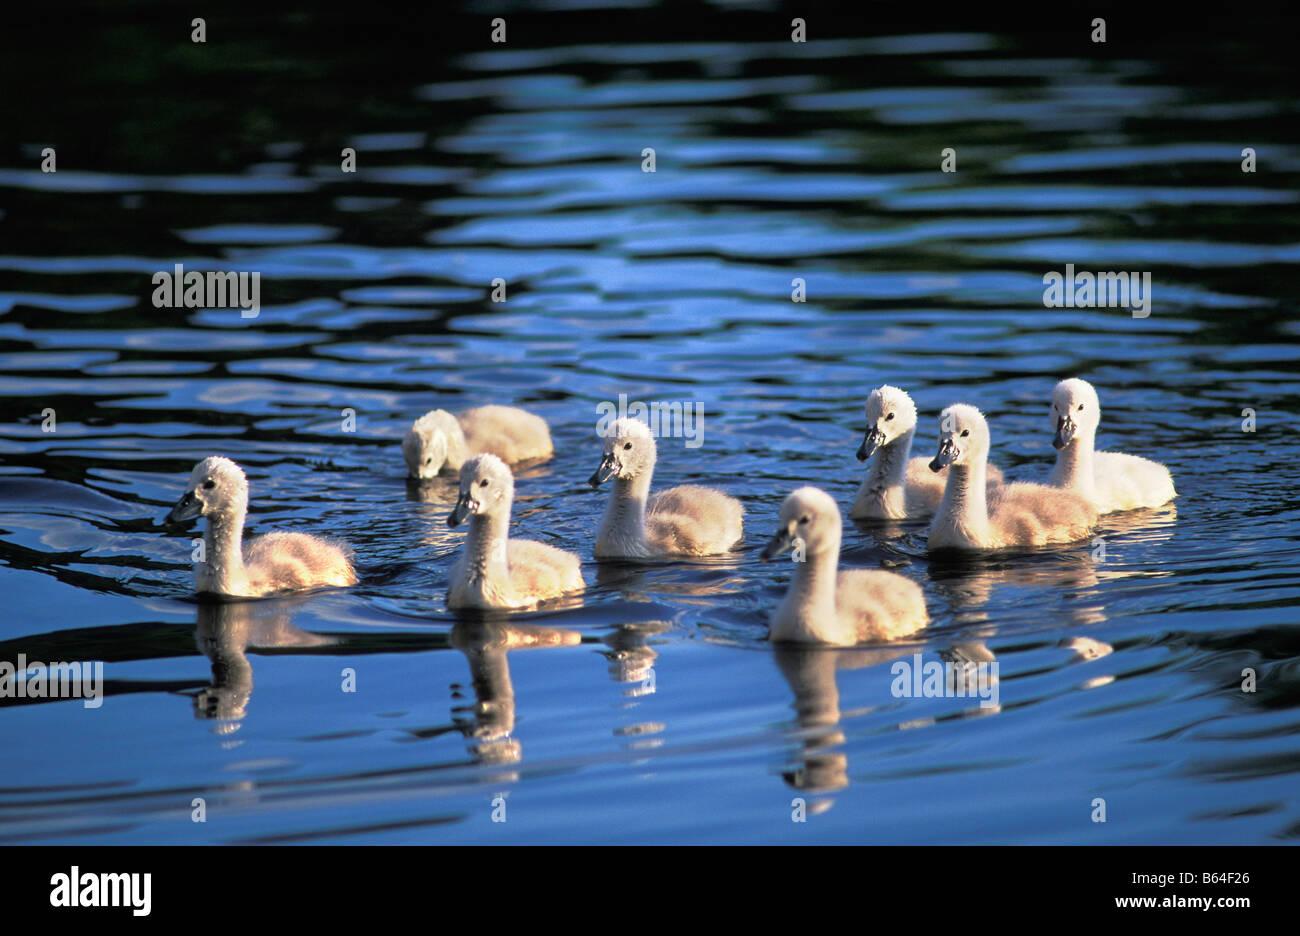 Holland, die Niederlande, Graveland. Junge Höckerschwäne (Cygnus Olor). Stockbild